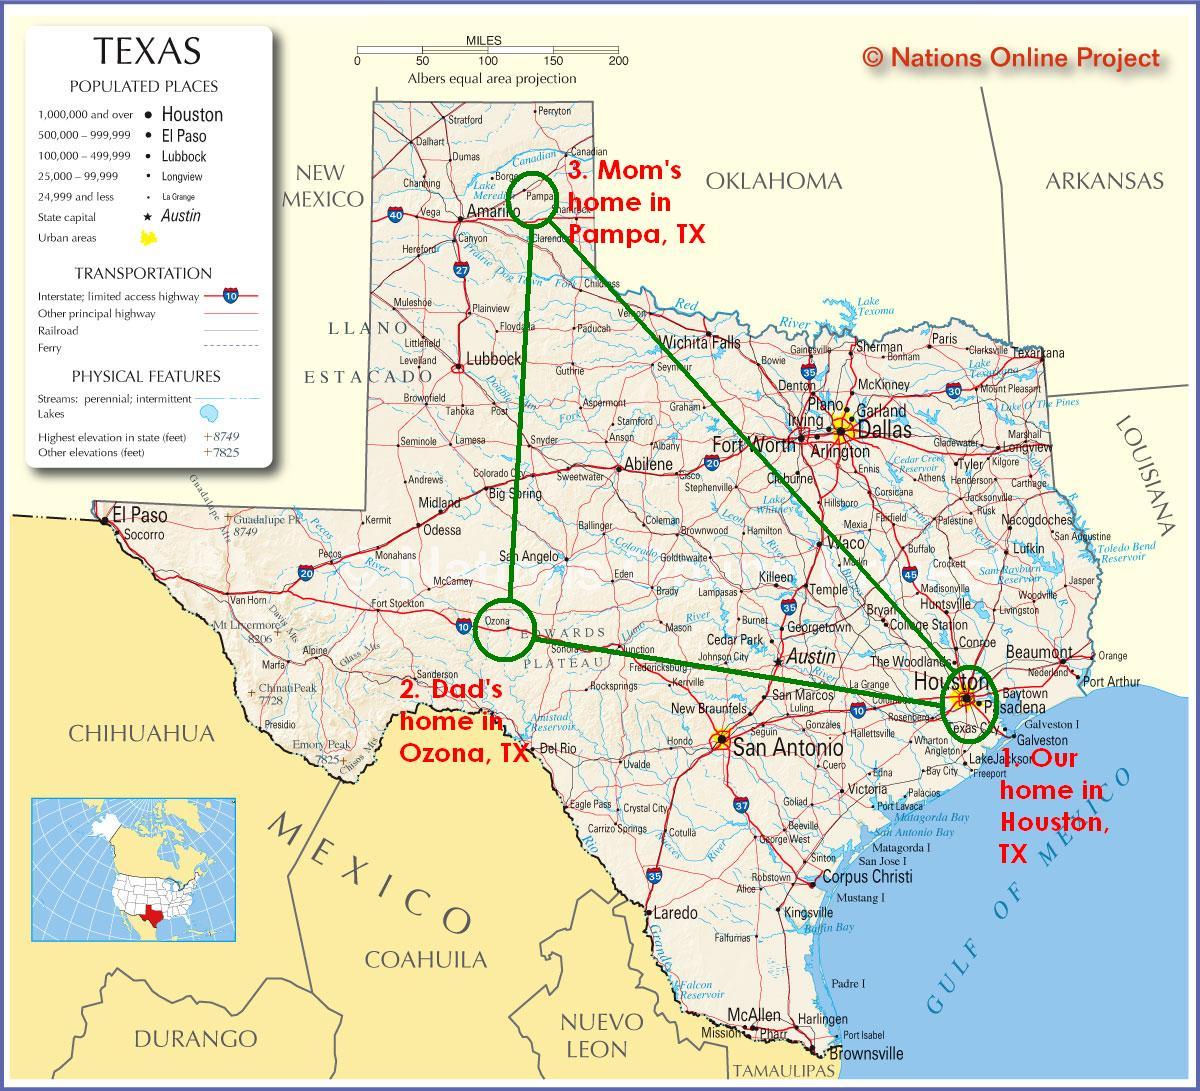 Ozona Texas Map | Business Ideas 2013 - Ozona Texas Map